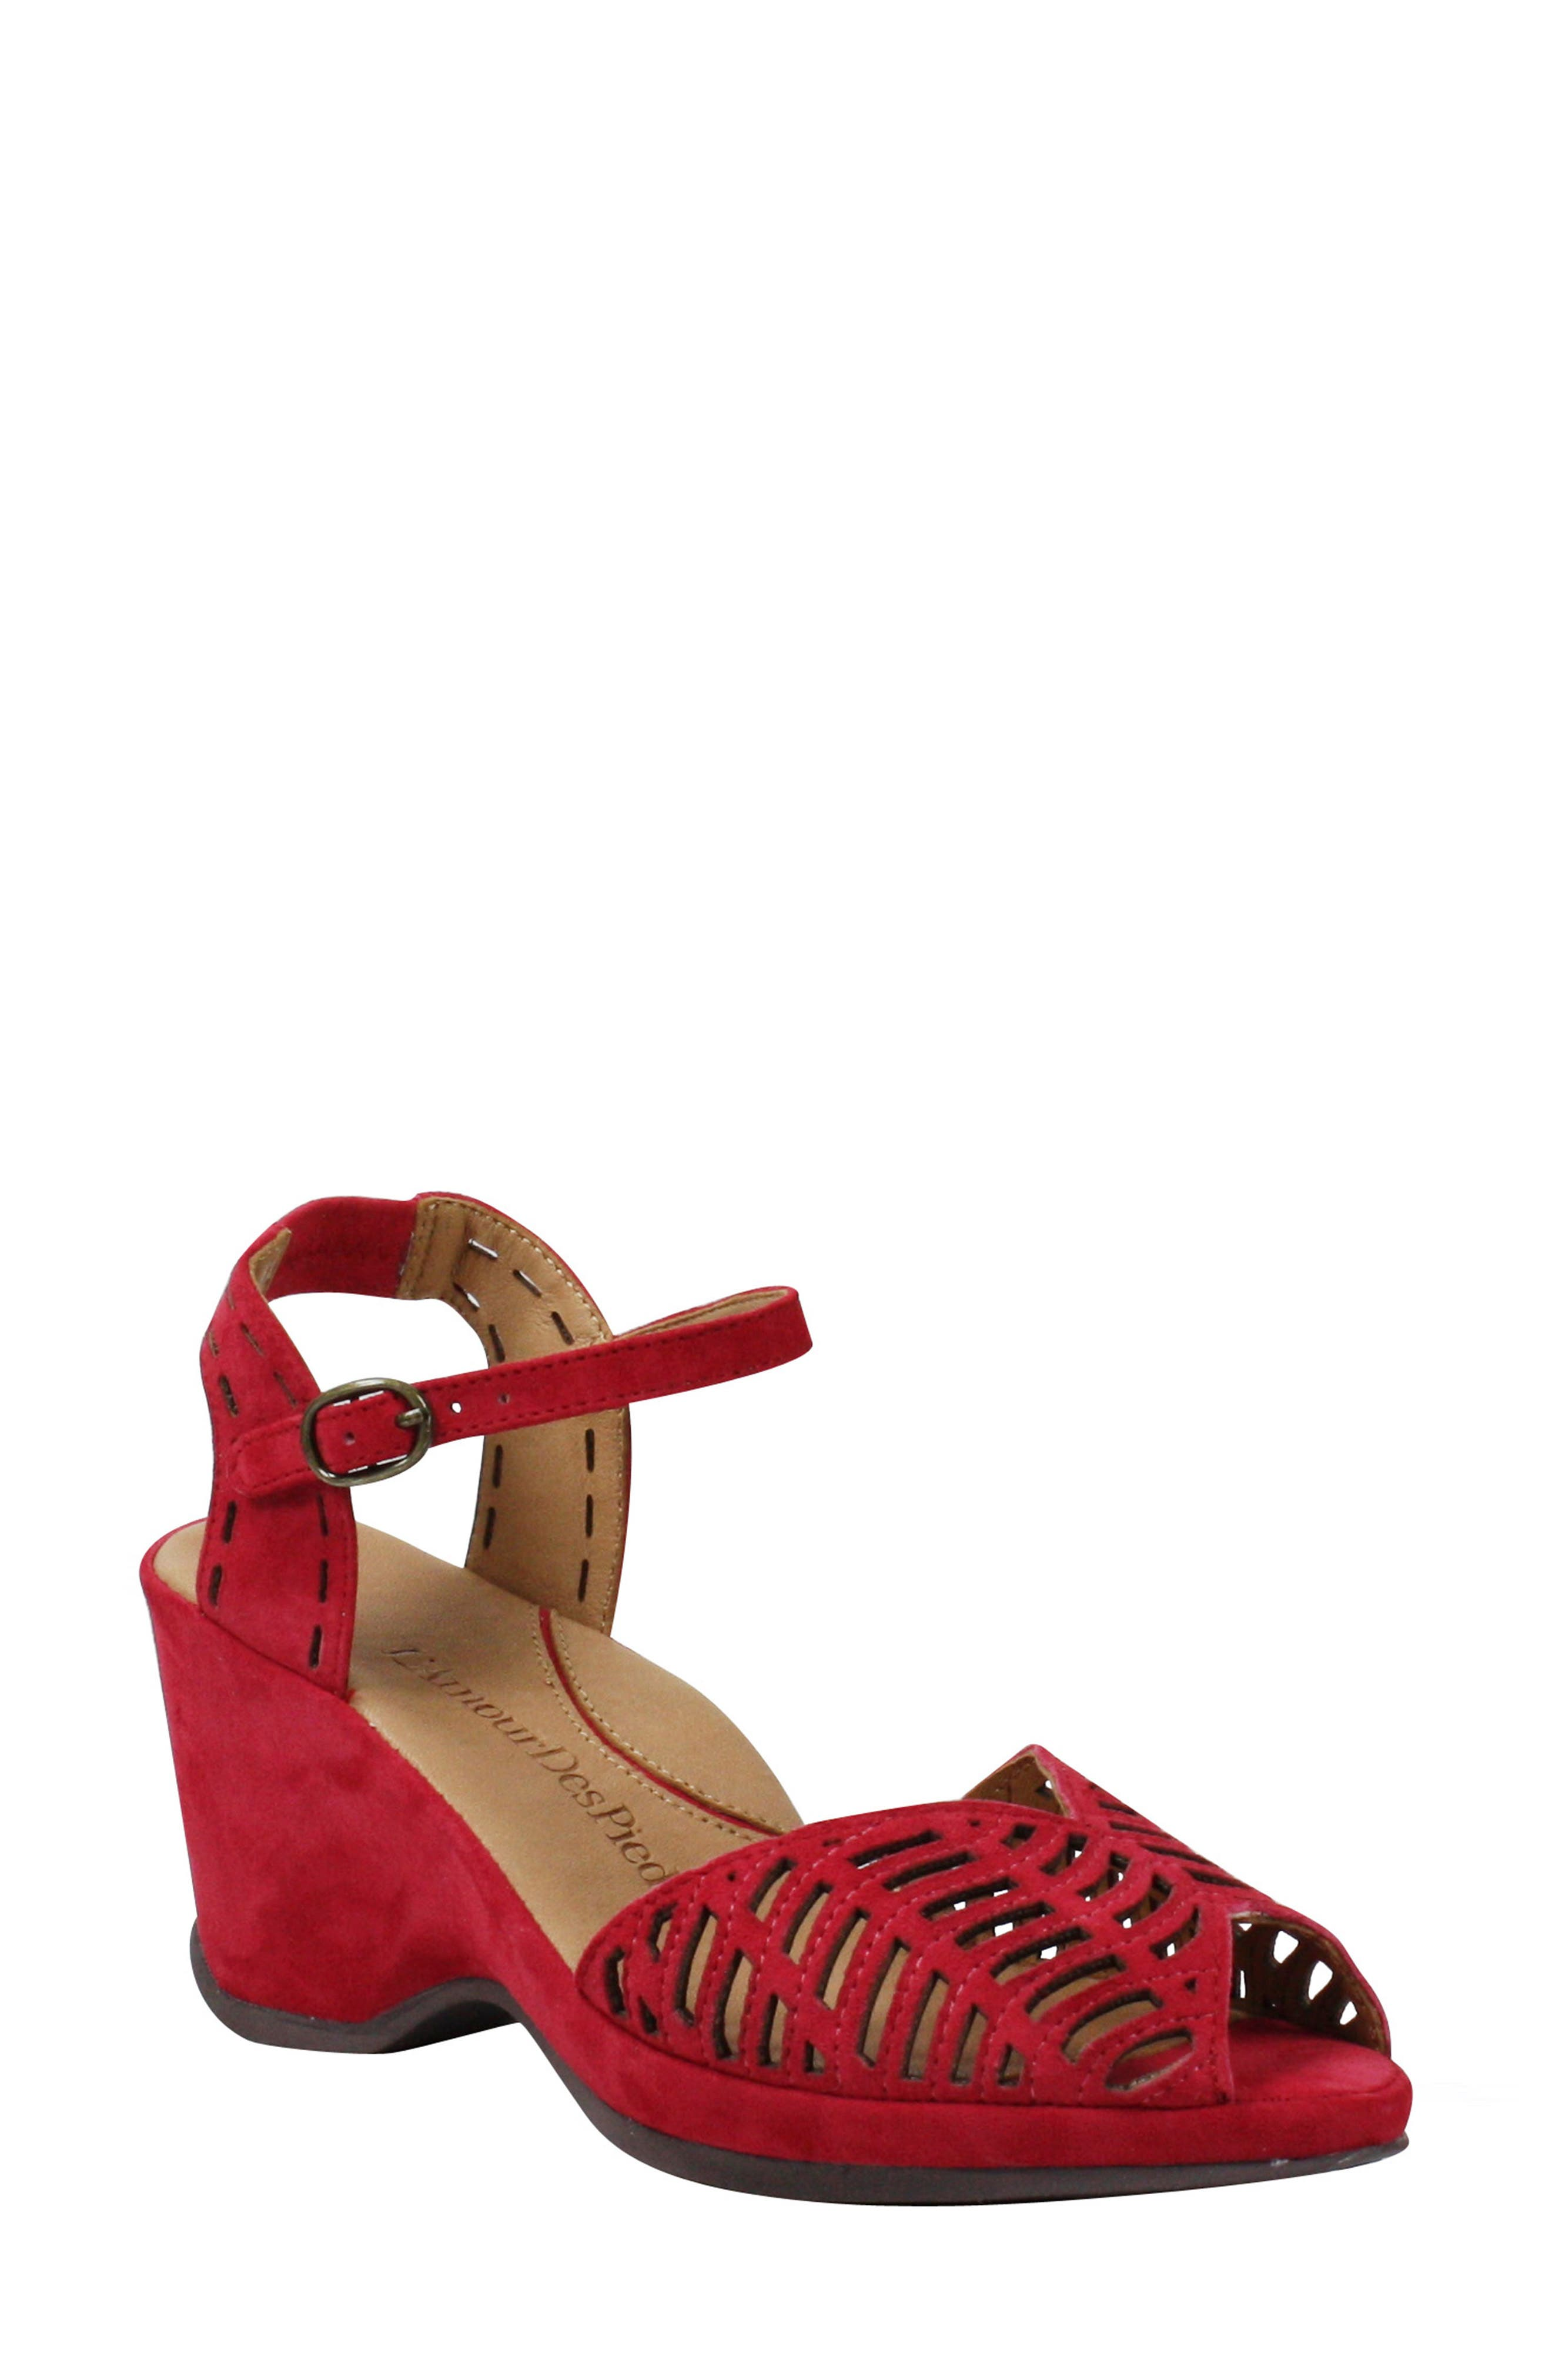 1940s Style Shoes, 40s Shoes Womens LAmour Des Pieds Oanez Wedge Sandal Size 10 M - Red $218.95 AT vintagedancer.com